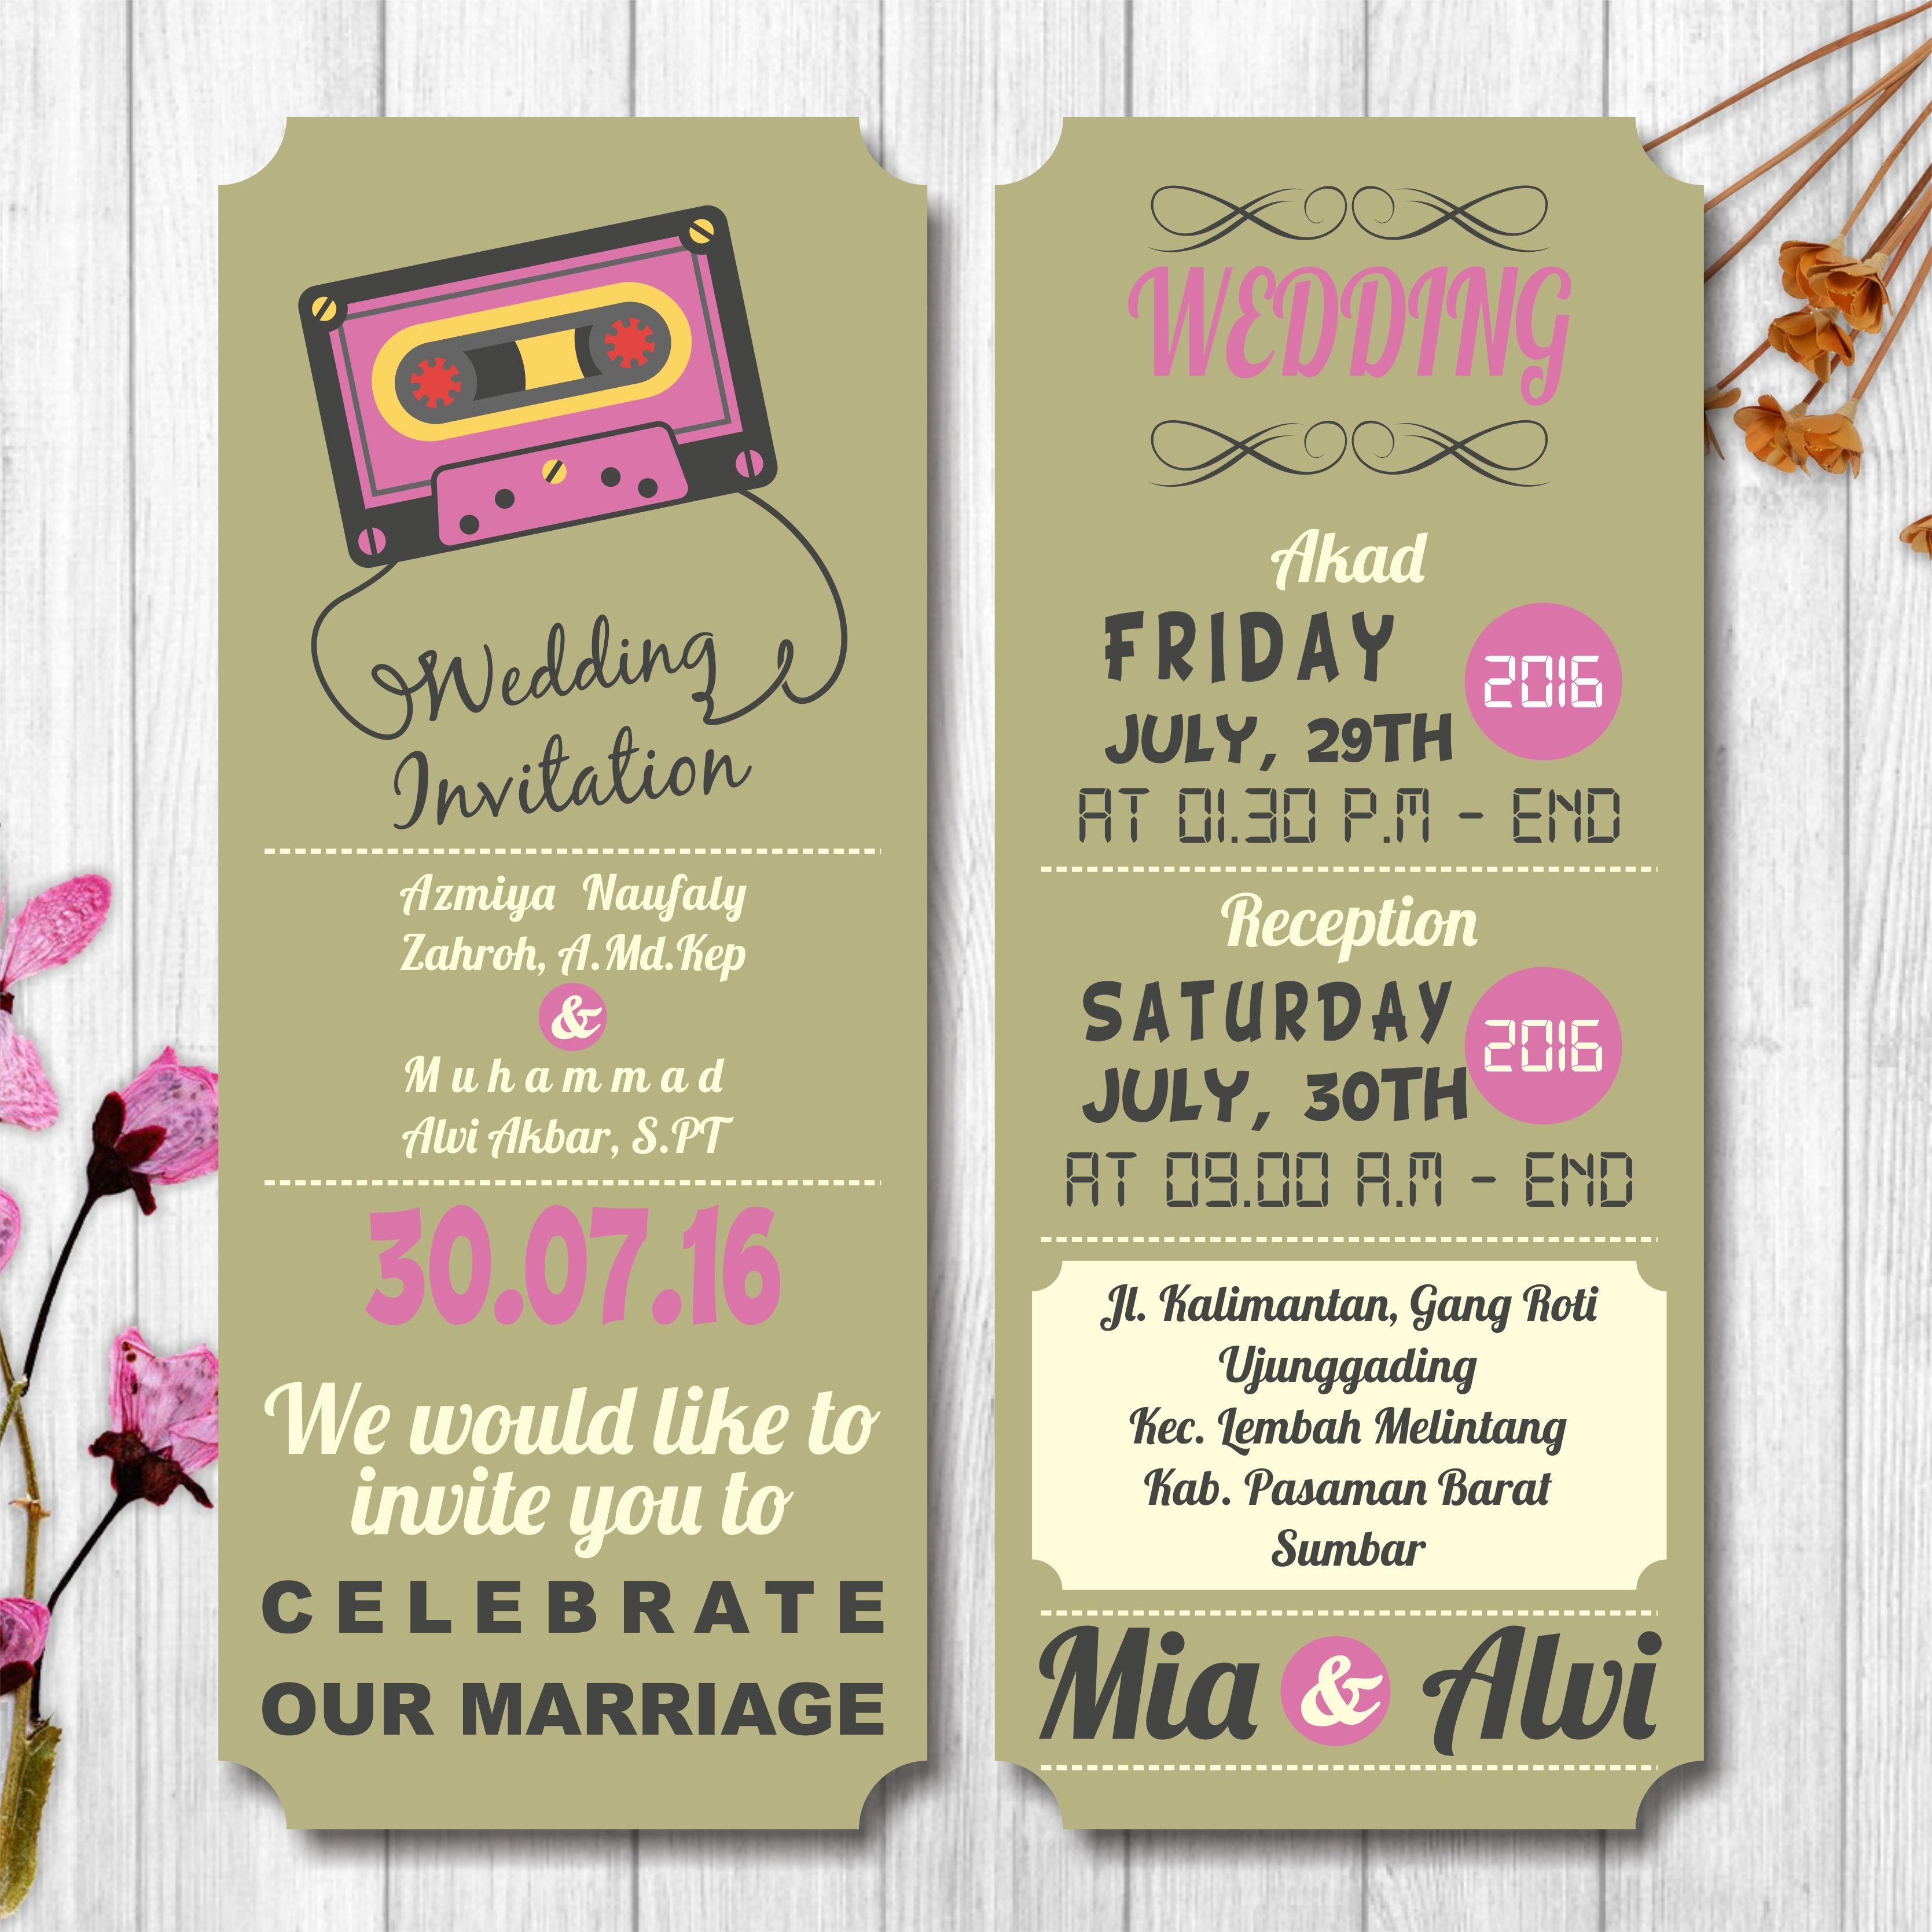 Online wedding invitation, e-invitation, wedding inviation | Wedding ...